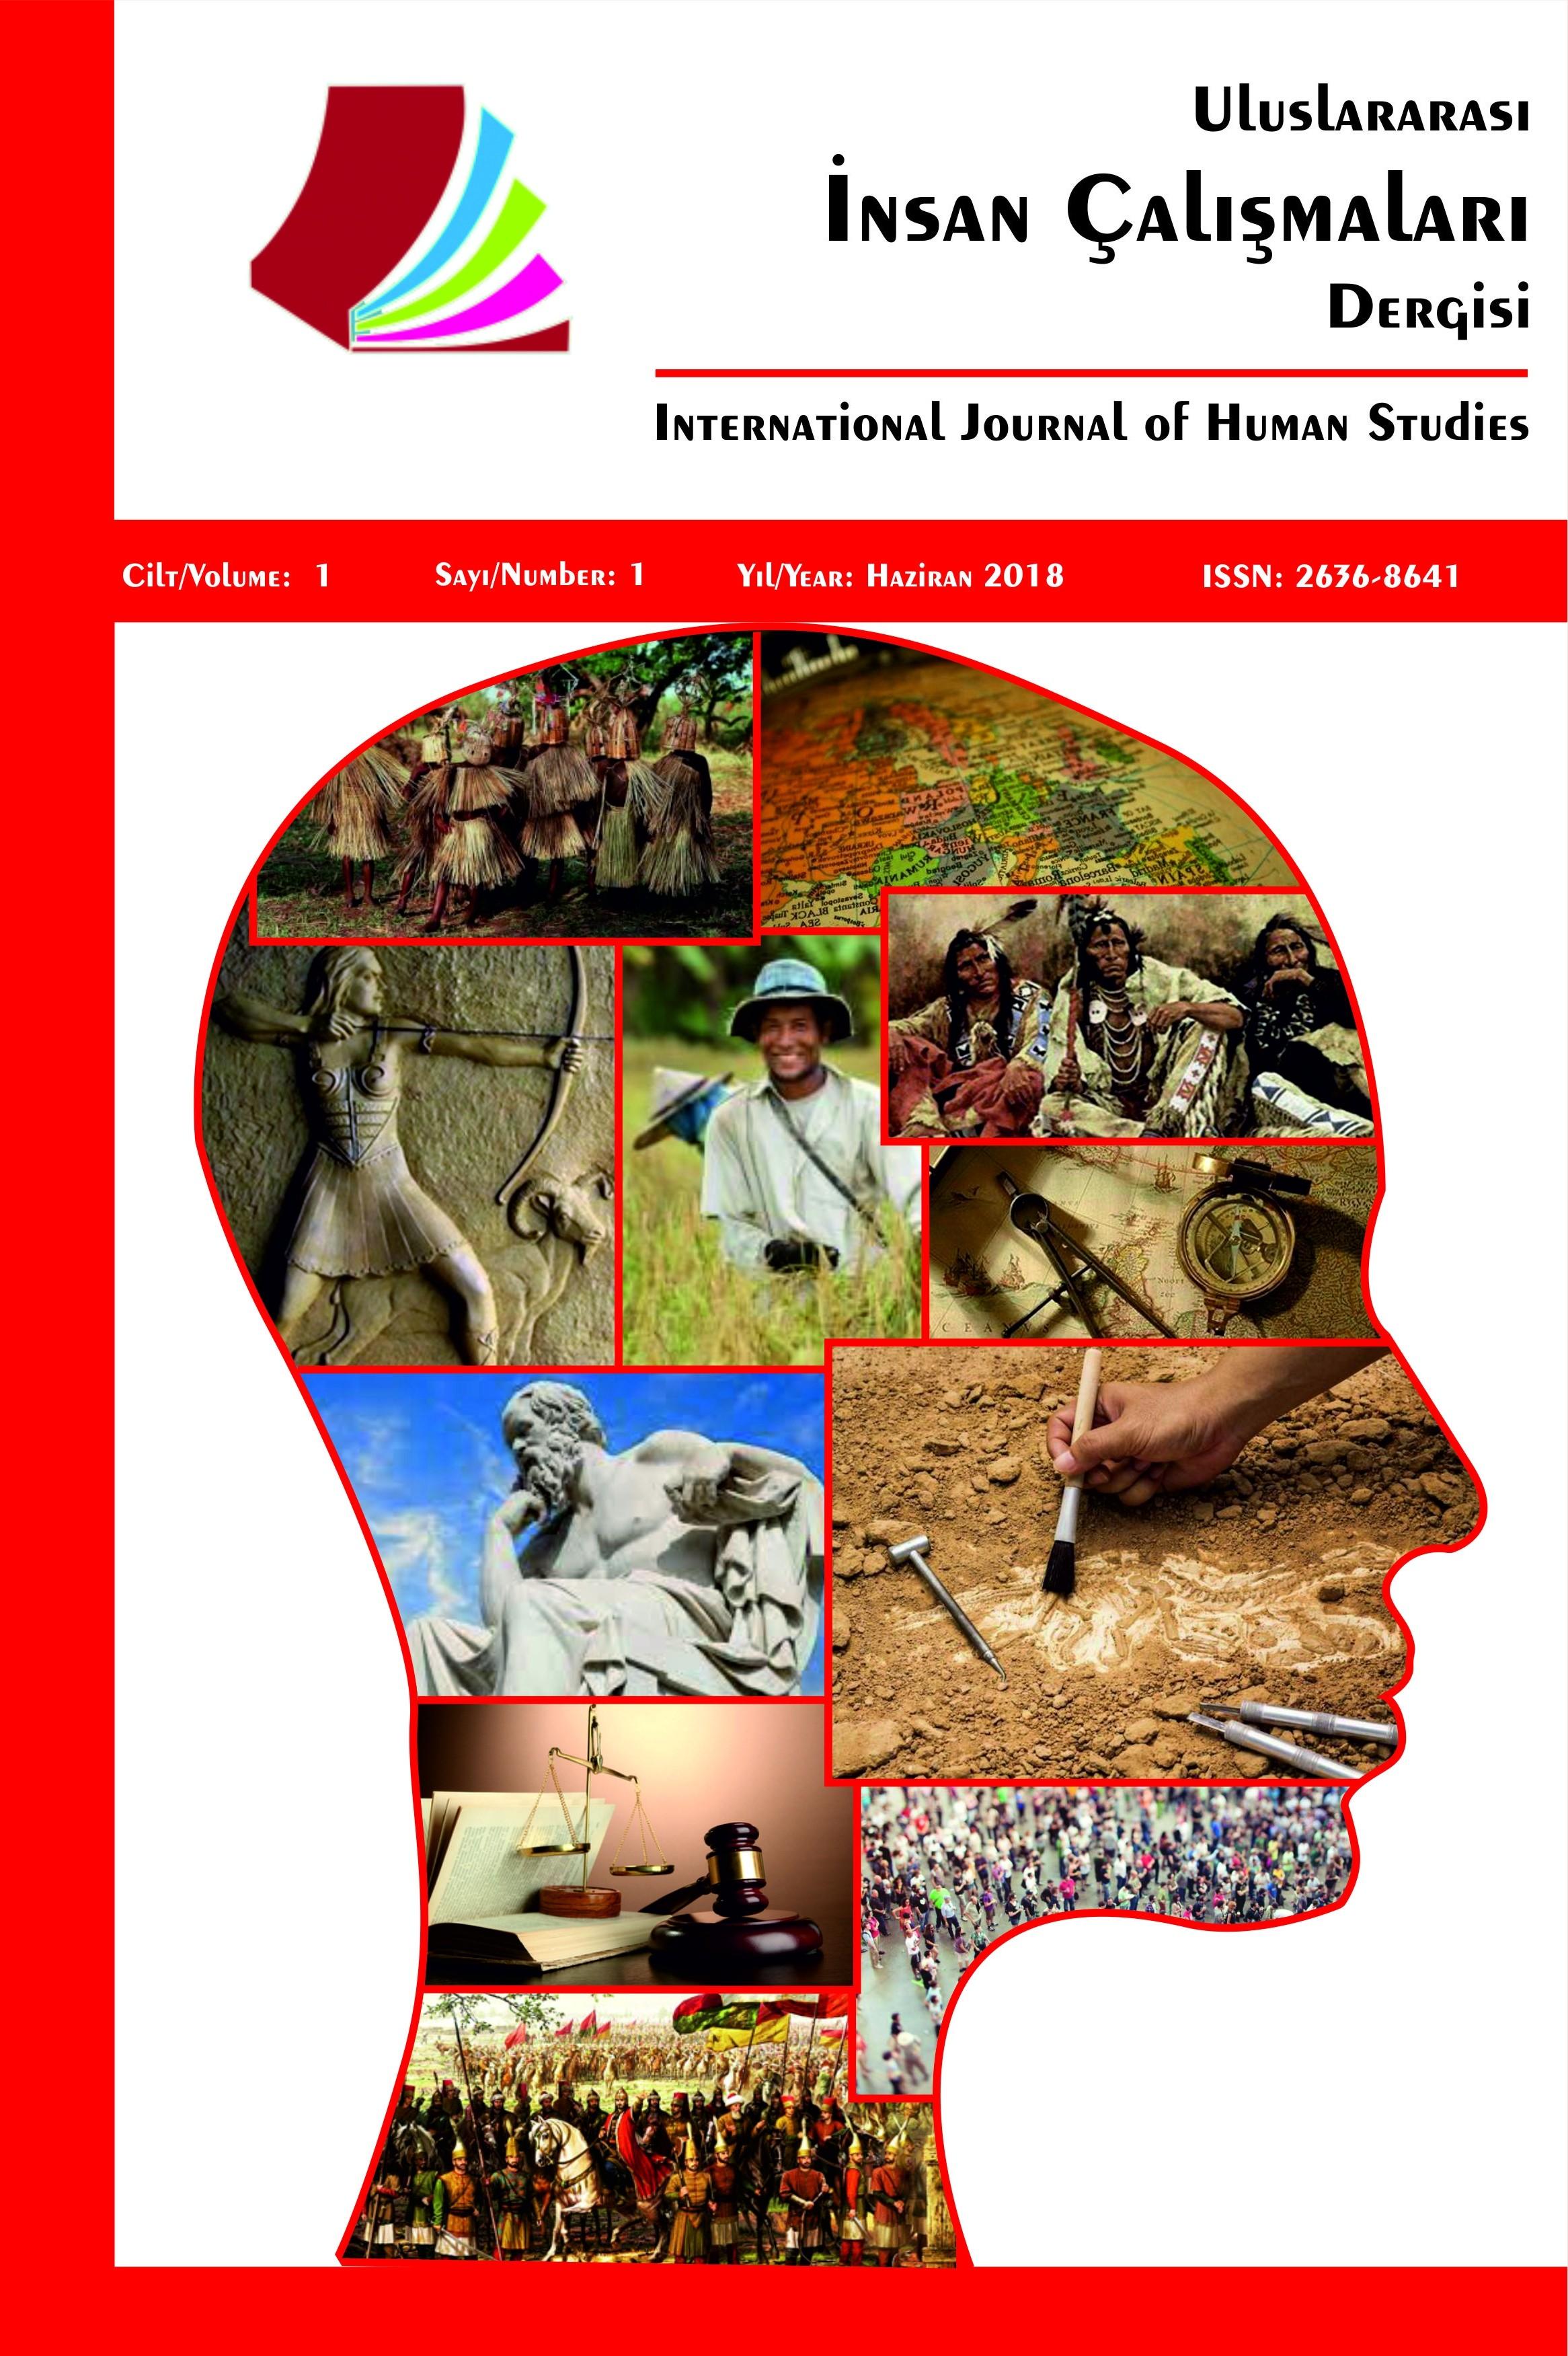 International Journal of Human Studies